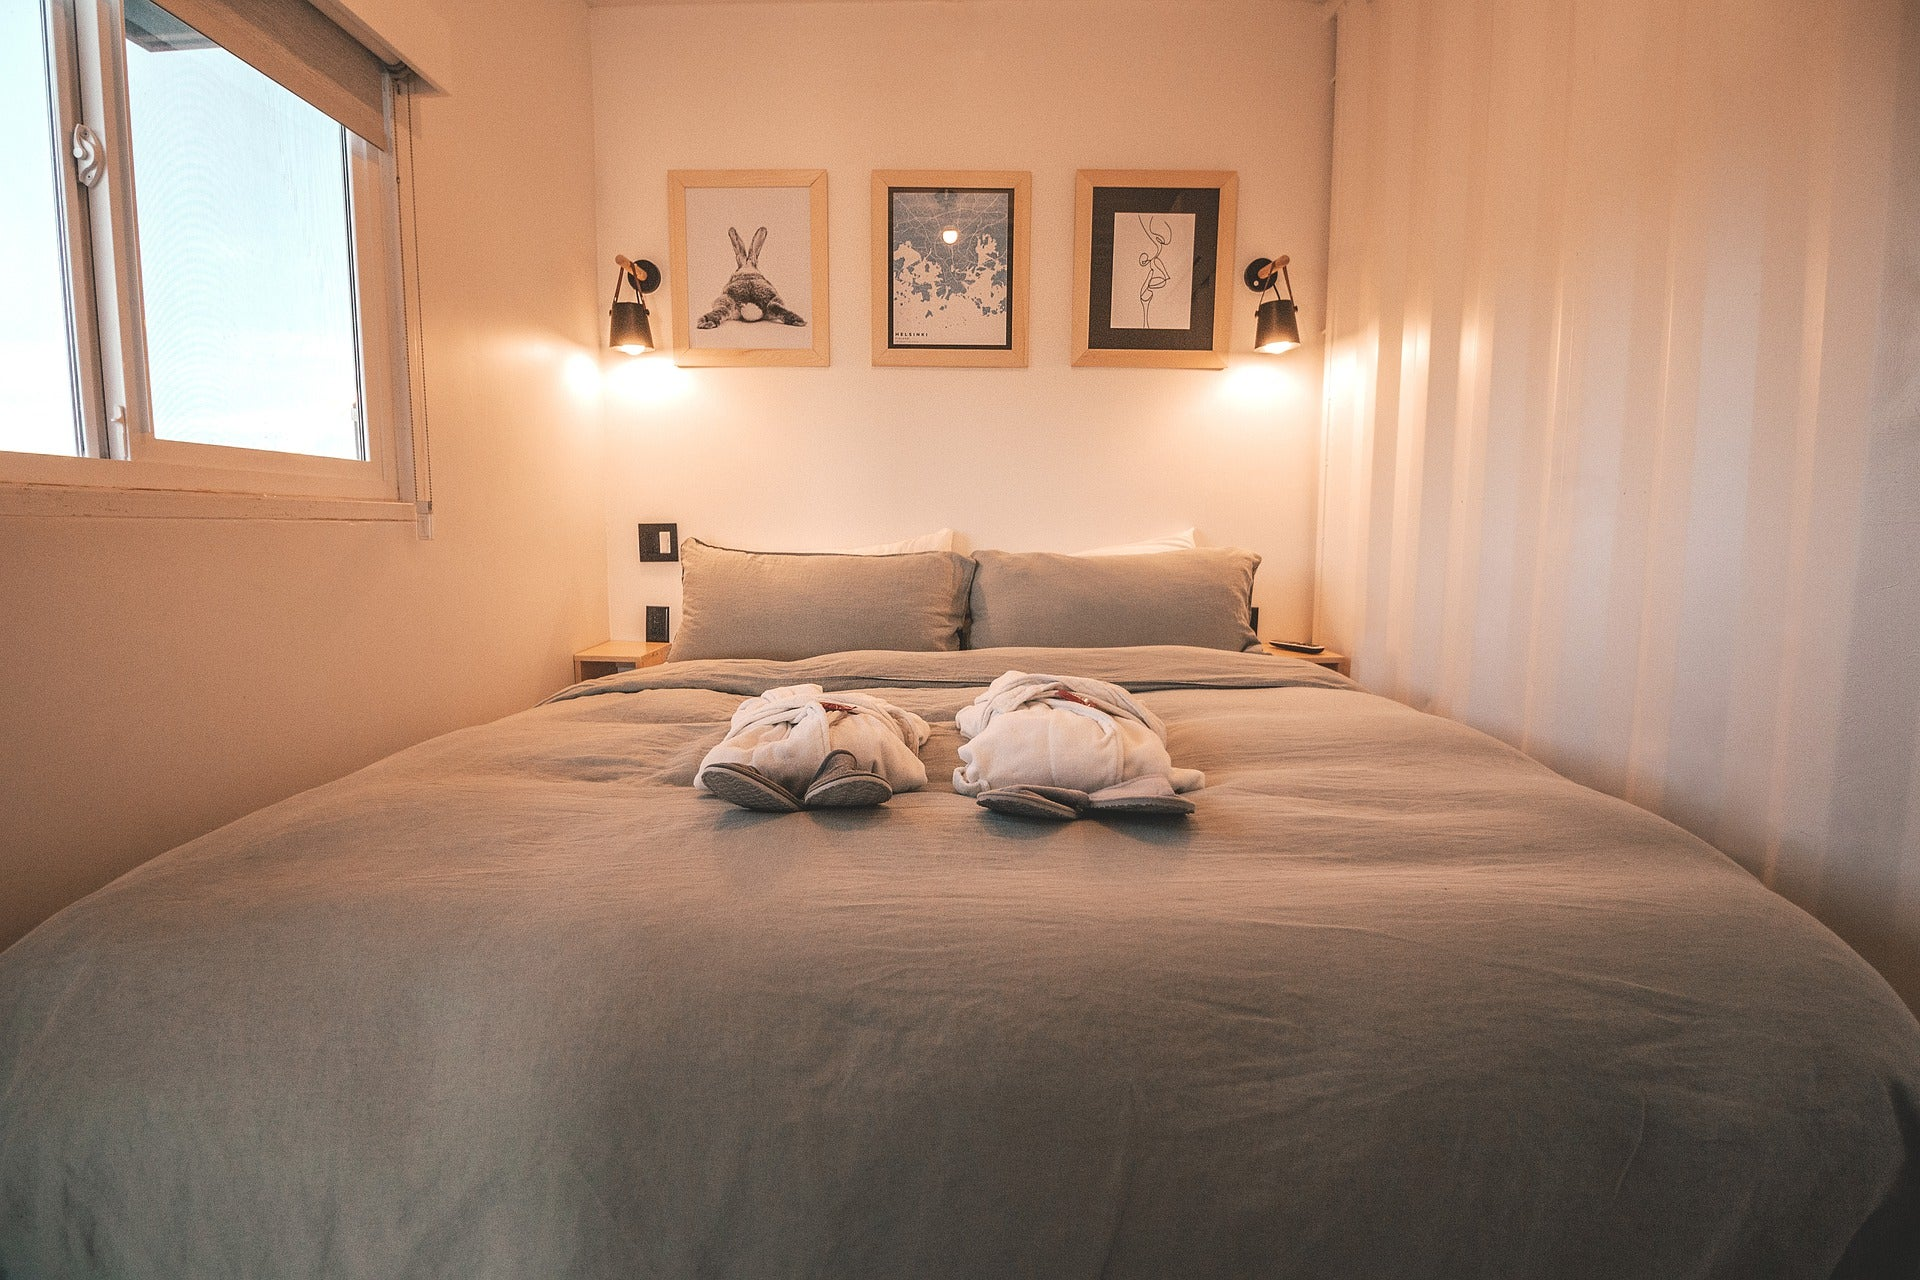 Should You Book An Airbnb That Has No Reviews? | Lifehacker Australia